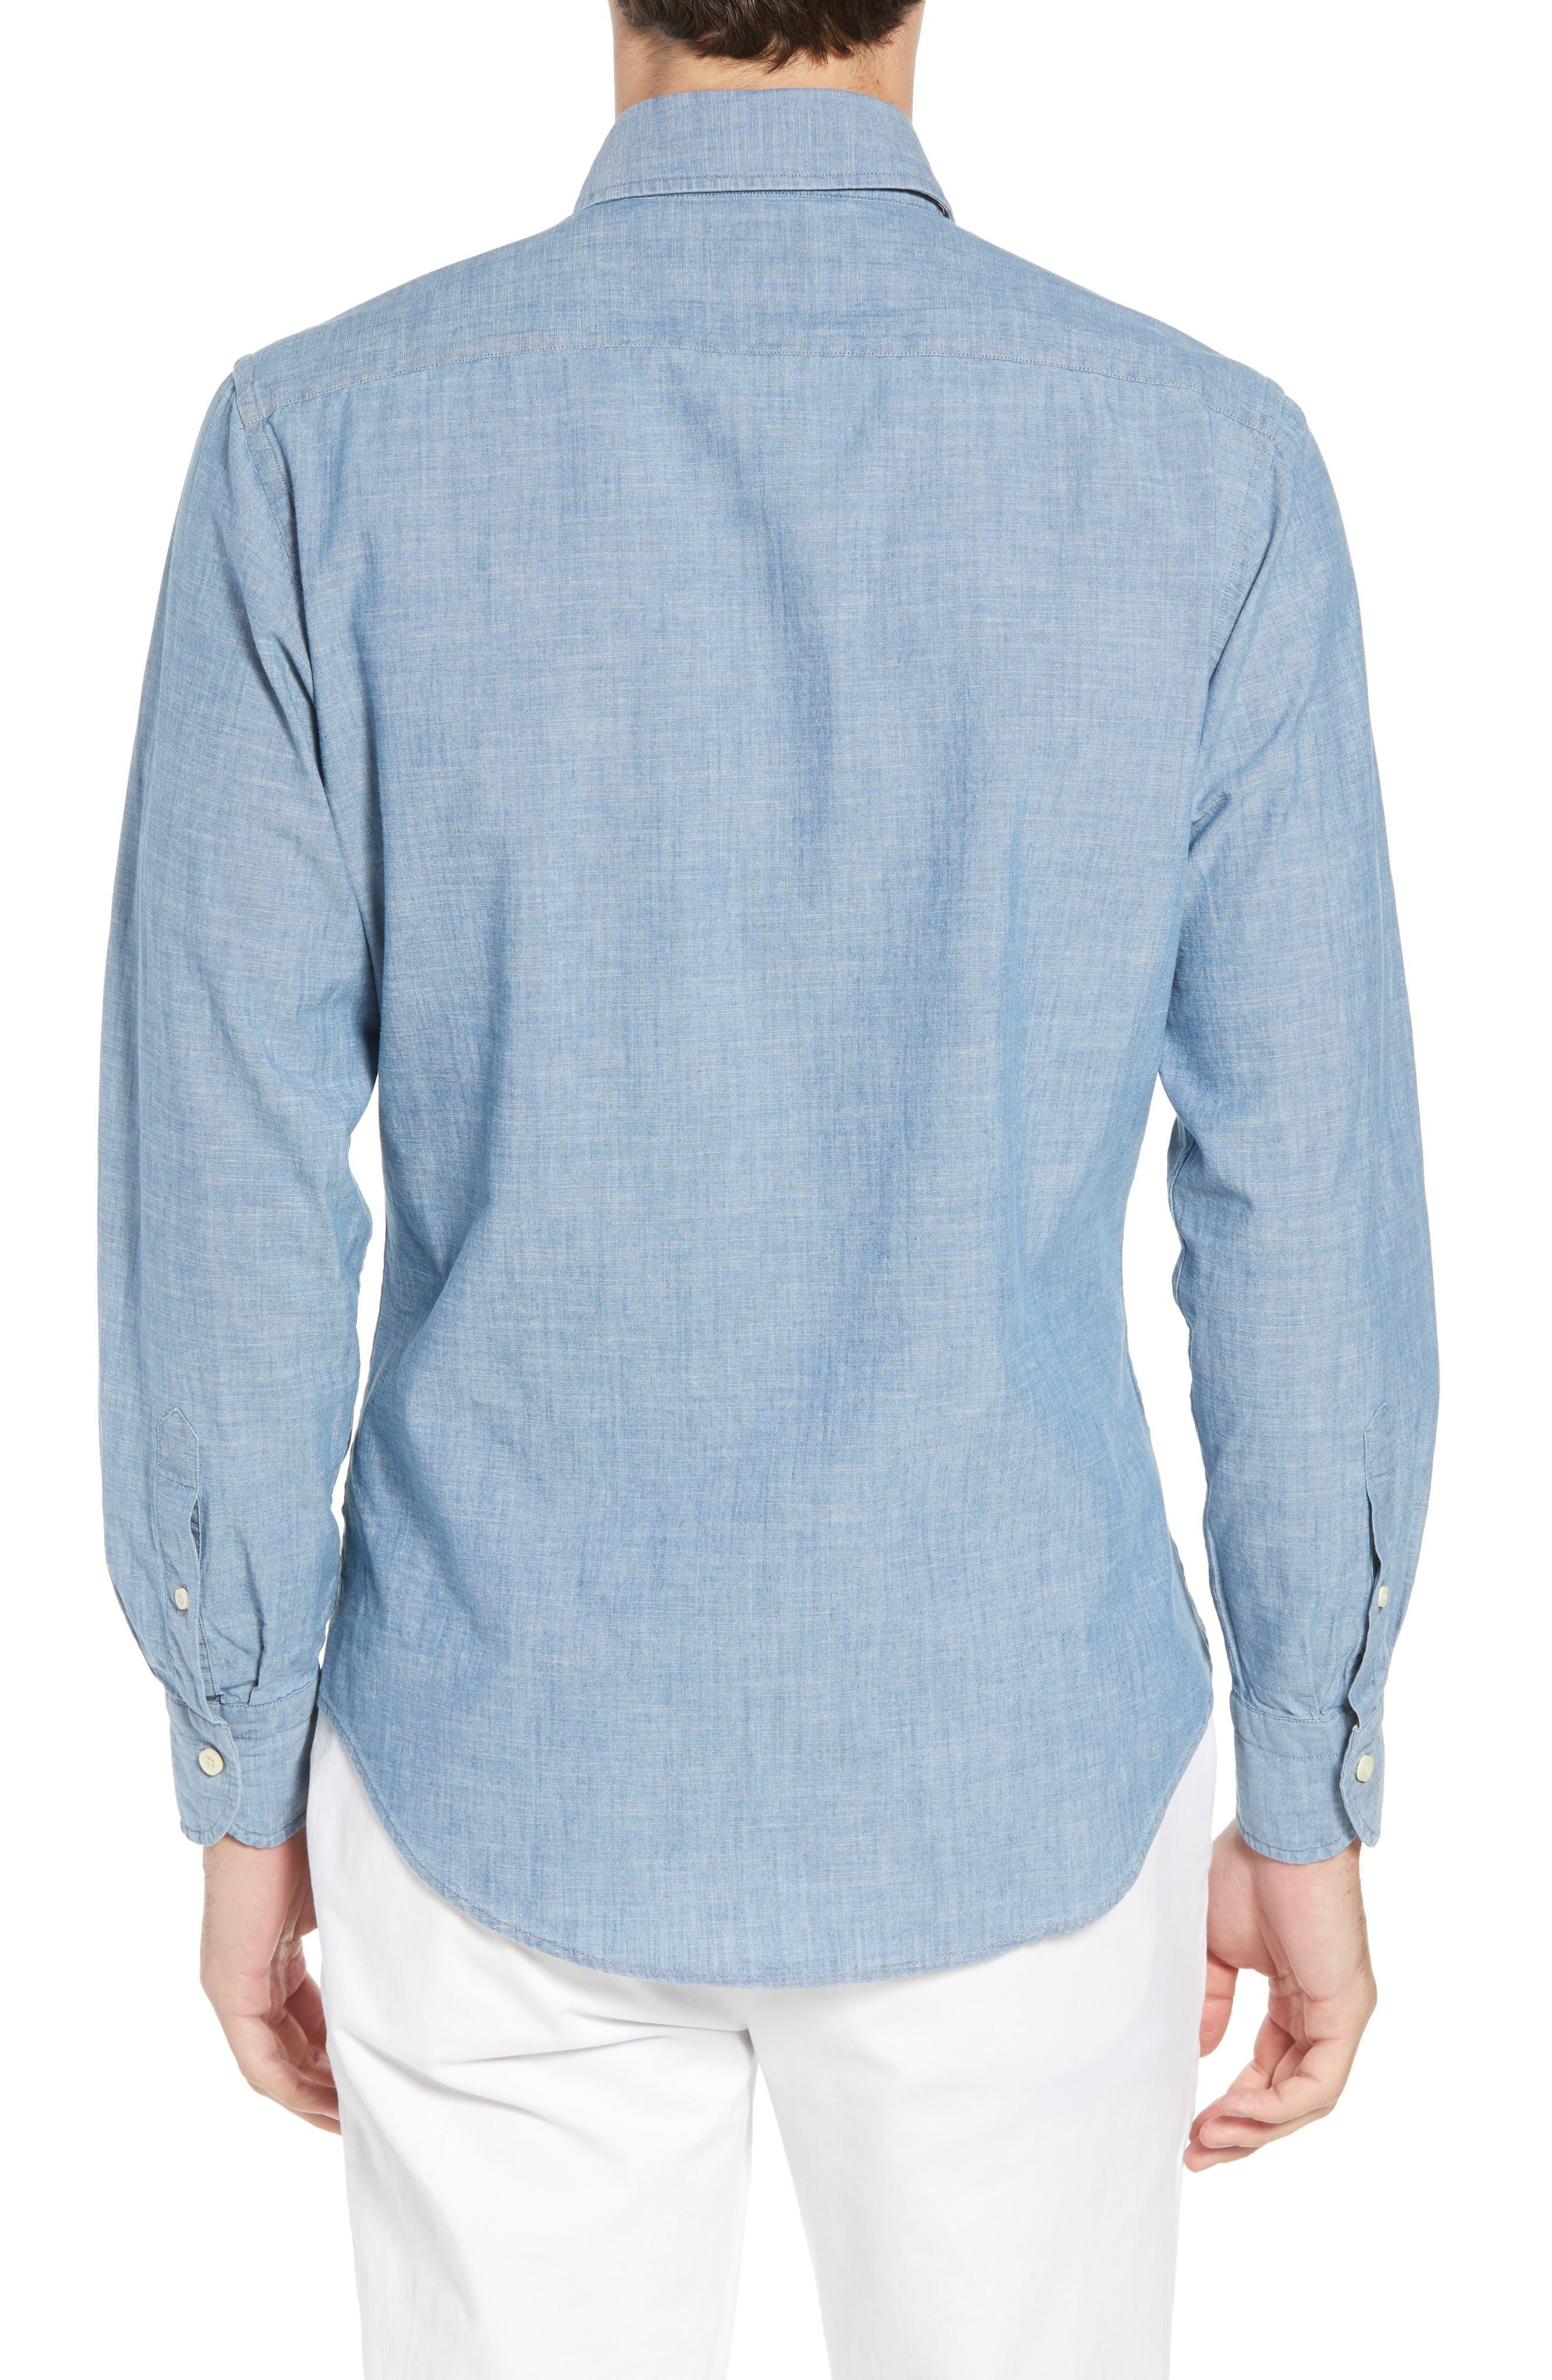 Ancroft Slim Fit Chambray Sport Shirt,                             Alternate thumbnail 2, color,                             Blue